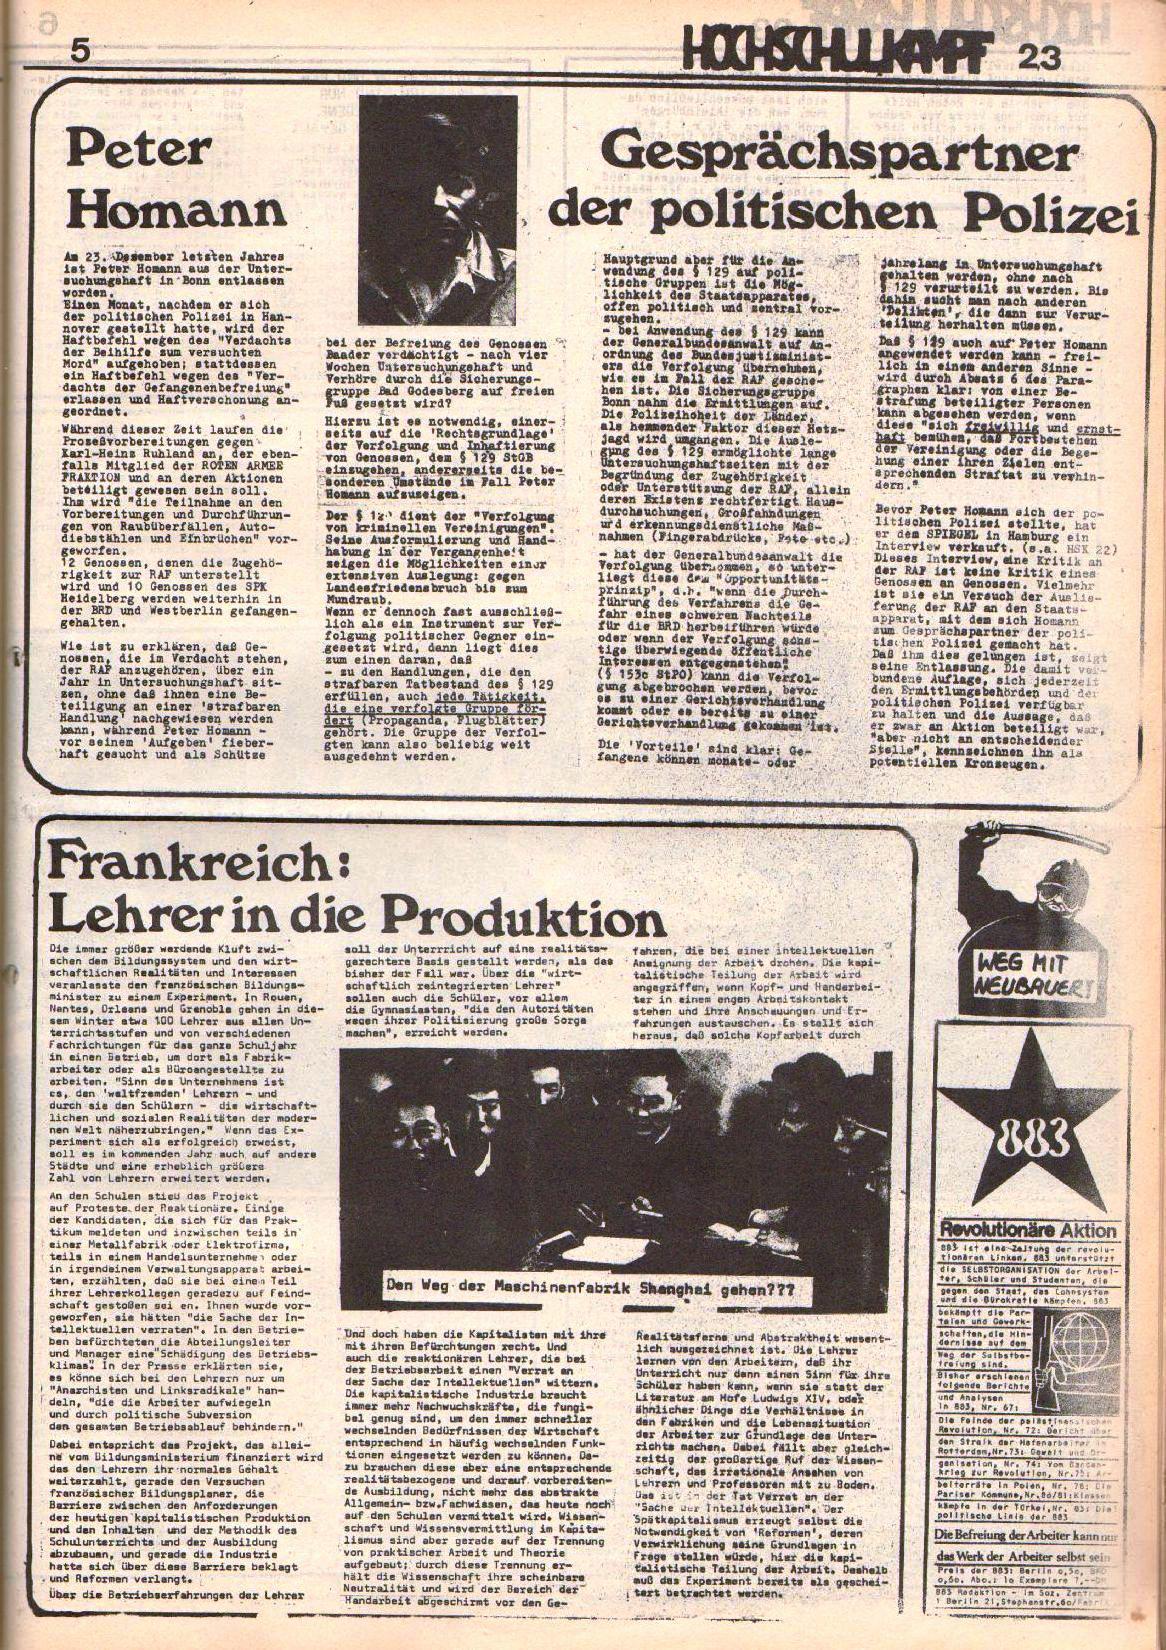 Berlin_Hochschulkampf_1971_23_05